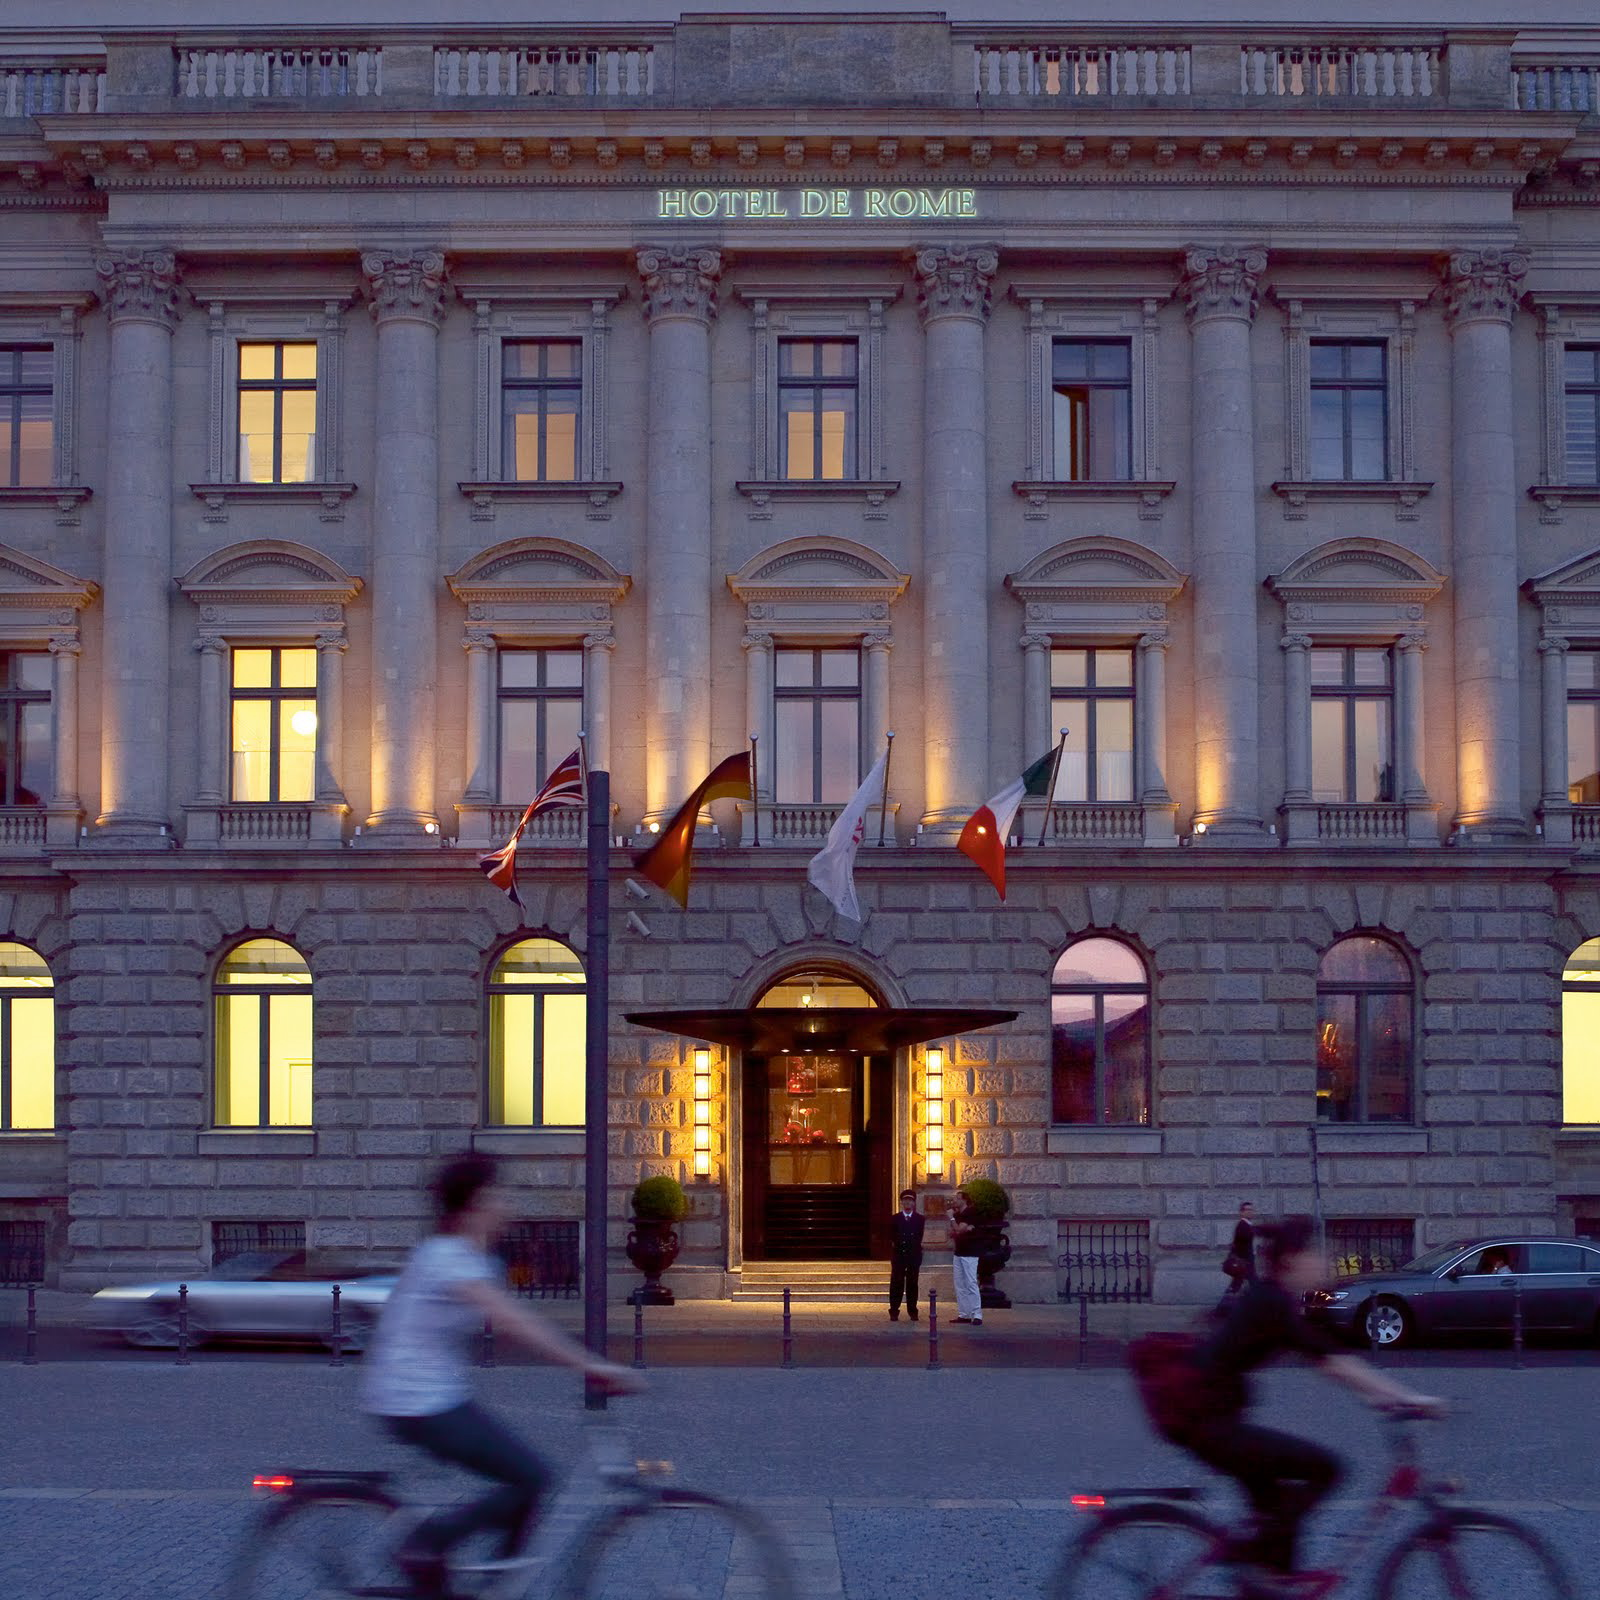 Hotel-de-Rome-Berlin-Gendarmenmarkt-3